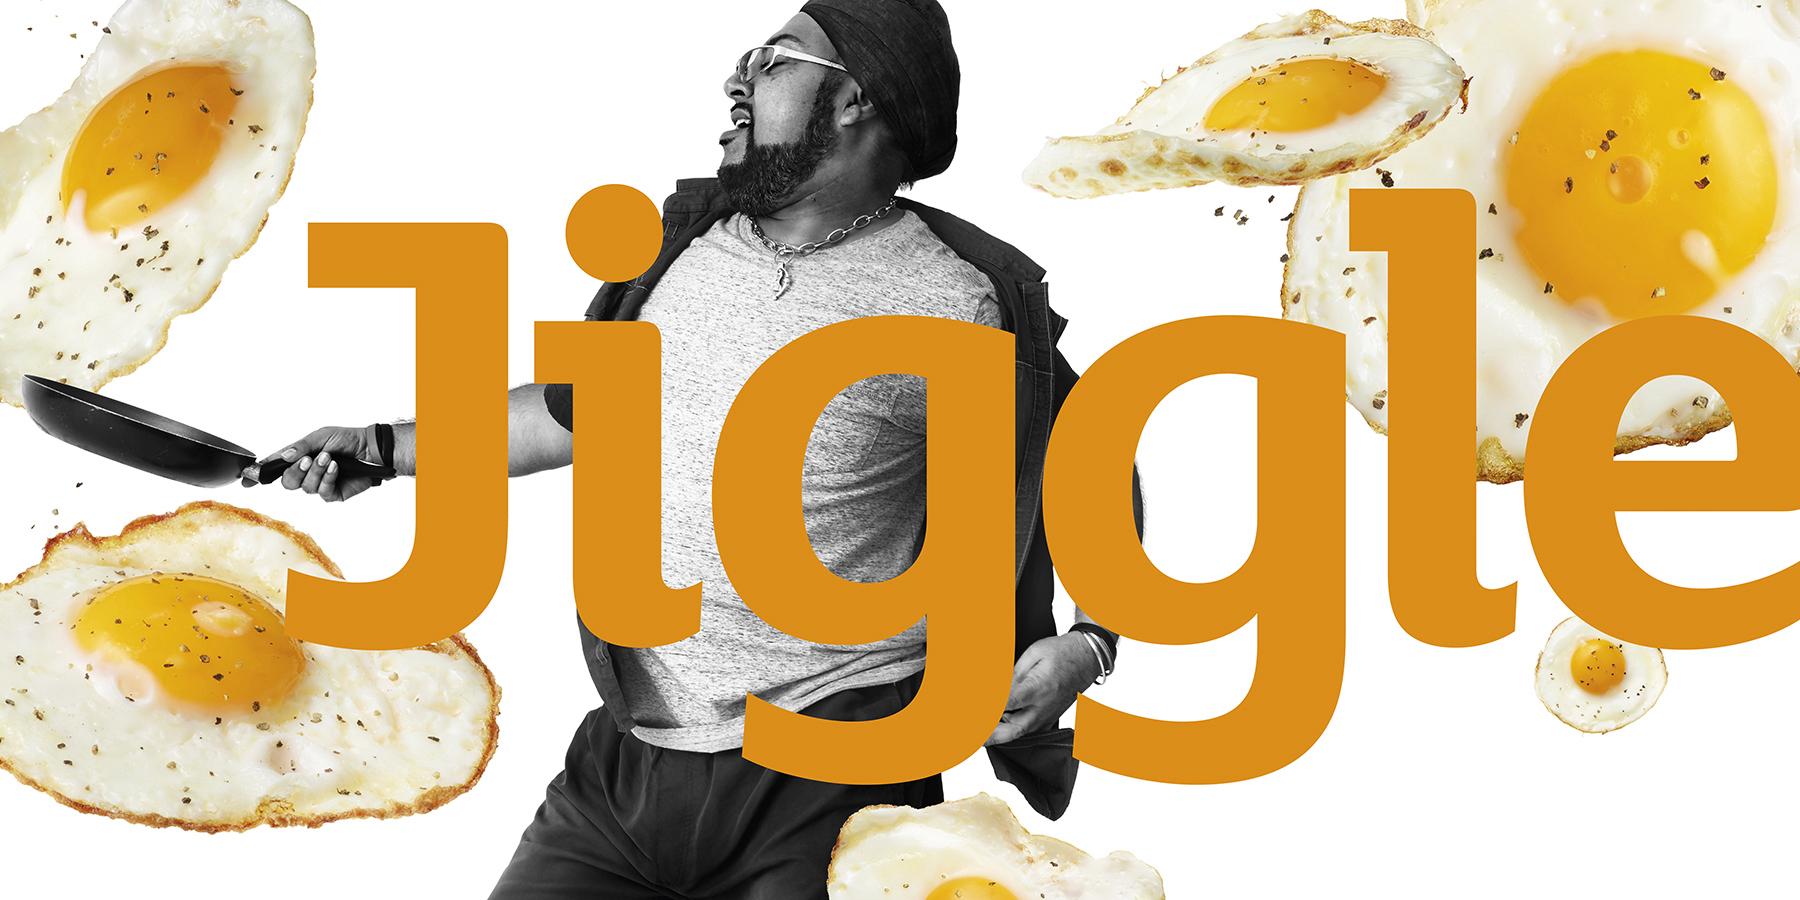 SAI01P16013_FoodDancing_Print_Jiggle_Landscape_Master_v01 copy